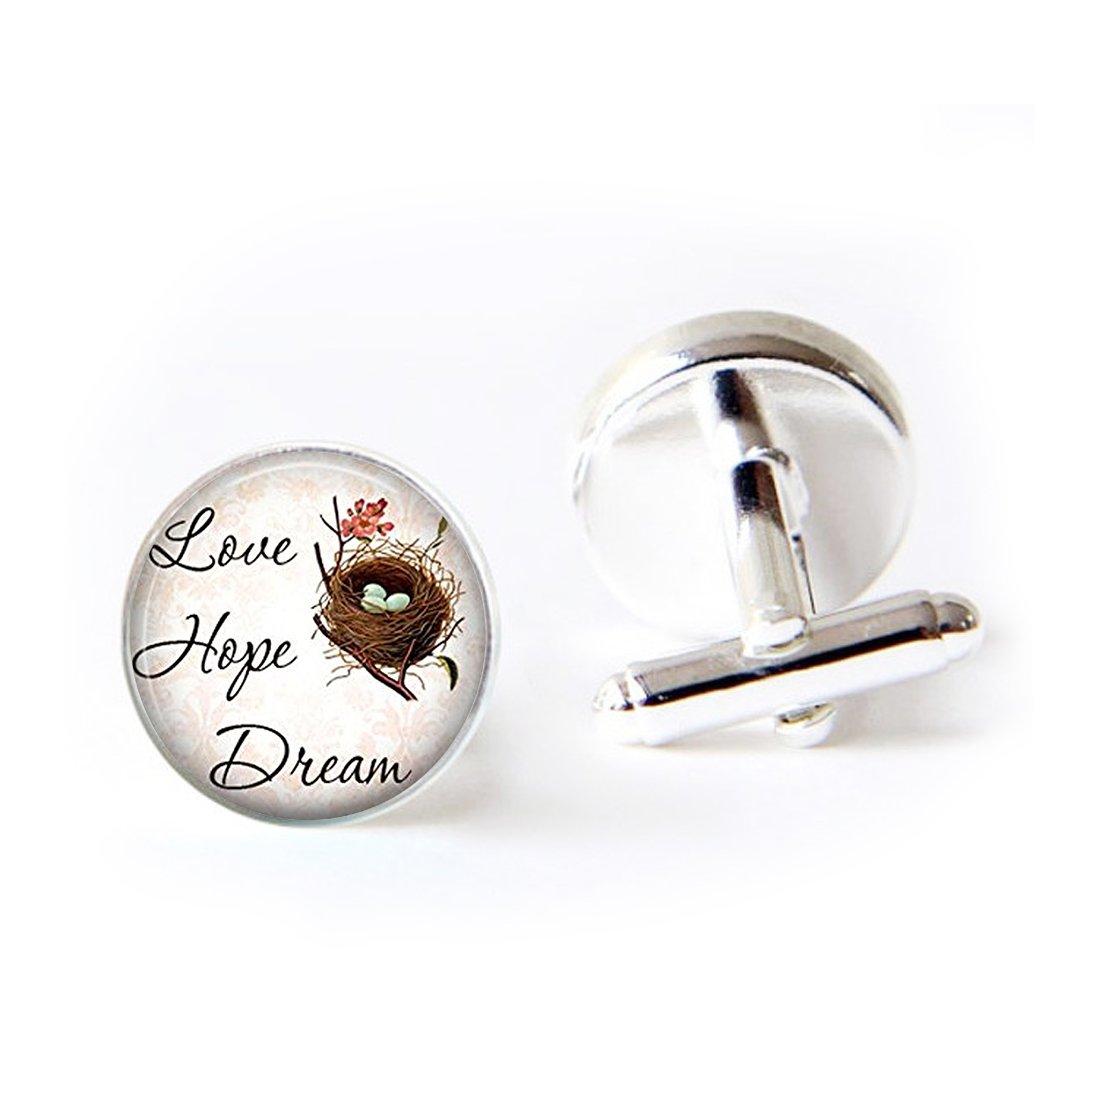 Unique Round Cufflinks Set Sayings Love Hope Dream Pendant Art Glass Cuff Dress Shirt Links Wedding Business Anniversary Gift for Him